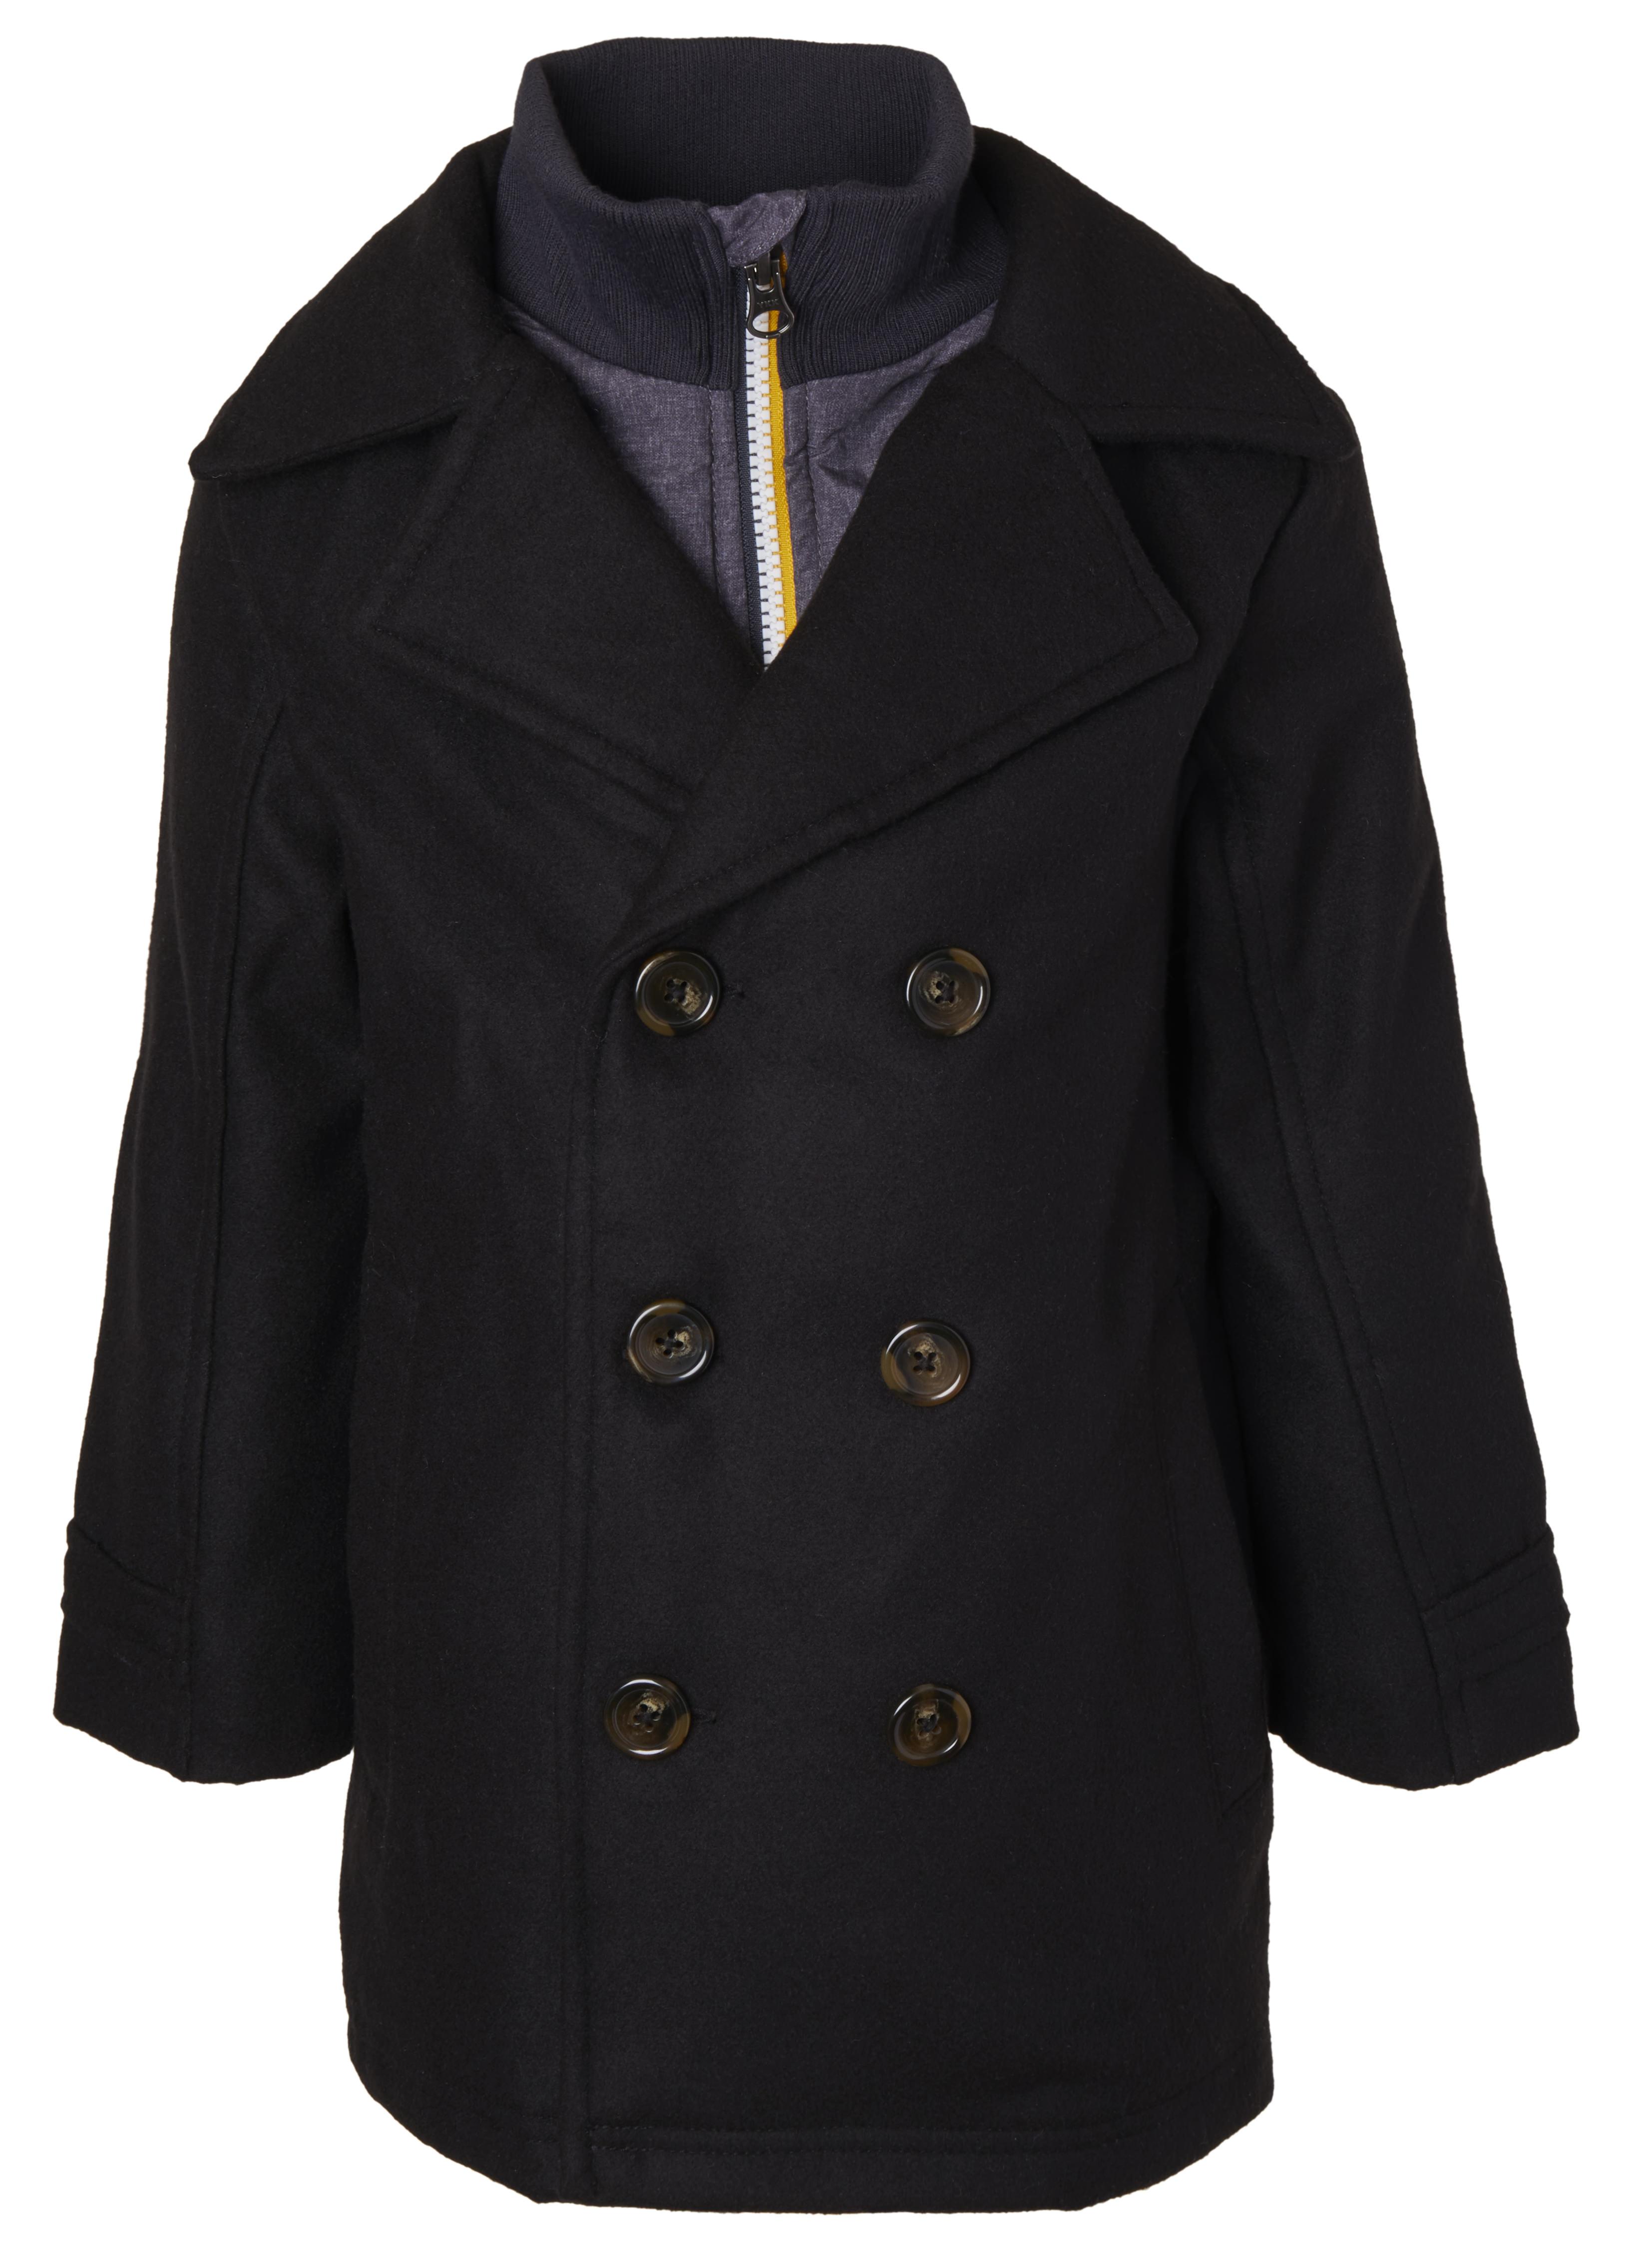 Sportoli Boys Classic Wool Look Lined Winter Vestee Dress Pea Coat Peacoat Jacket - Black Vestee (Size 4)